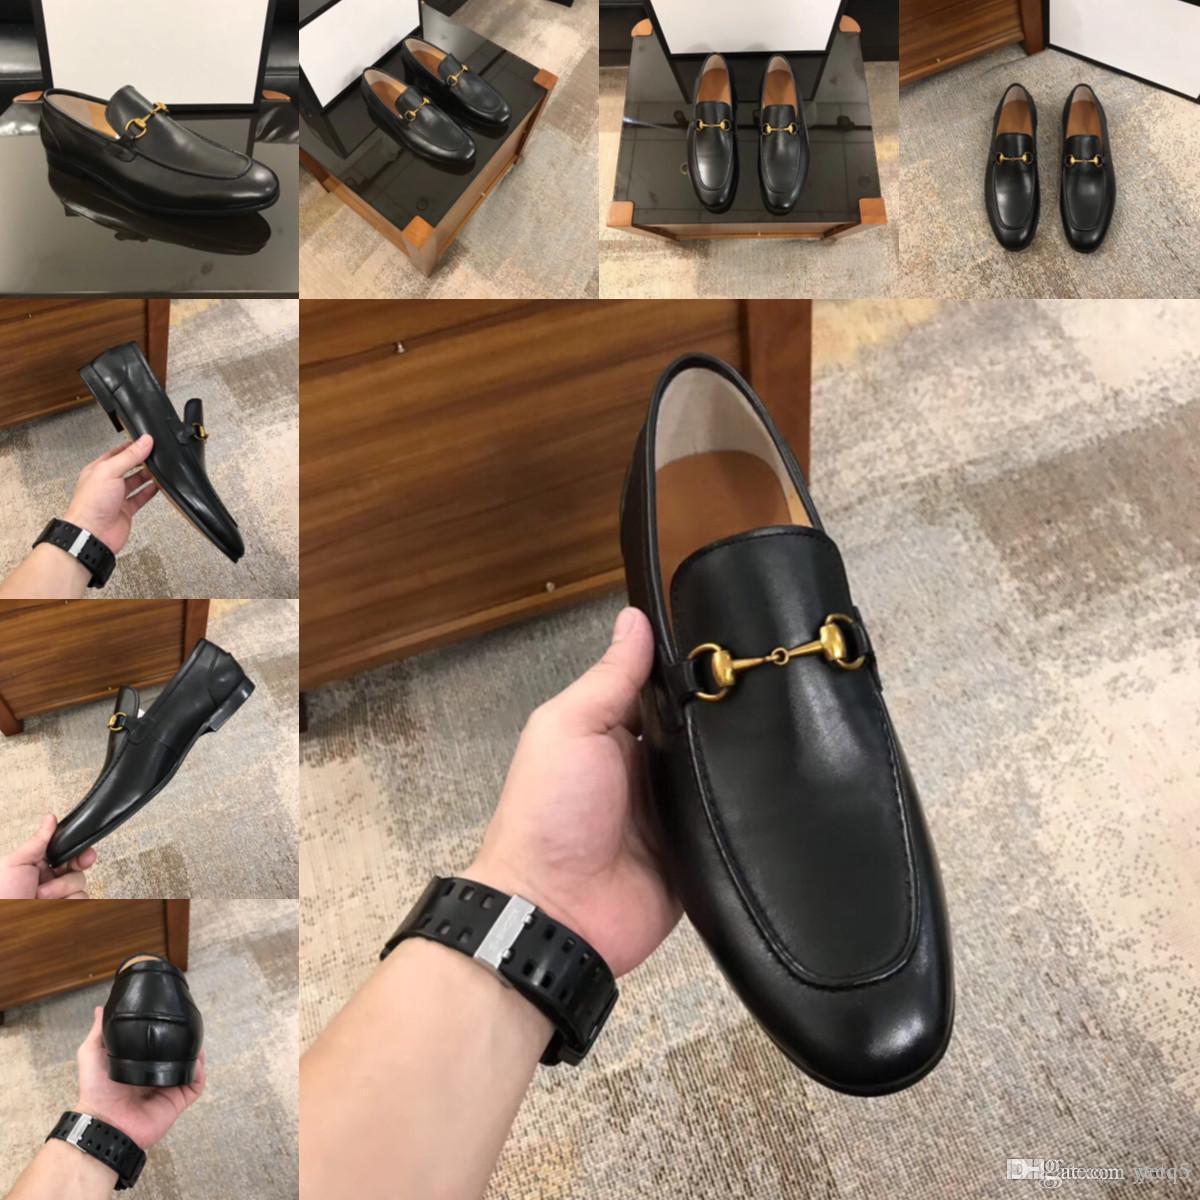 Scarpe da uomo di lusso Scarpe da sposa formali Scarpe da uomo Classic Mocassini da uomo Designer in pelle Designer Dress Shoes Sepatu Slip on Pria Chaussures Classique Homme